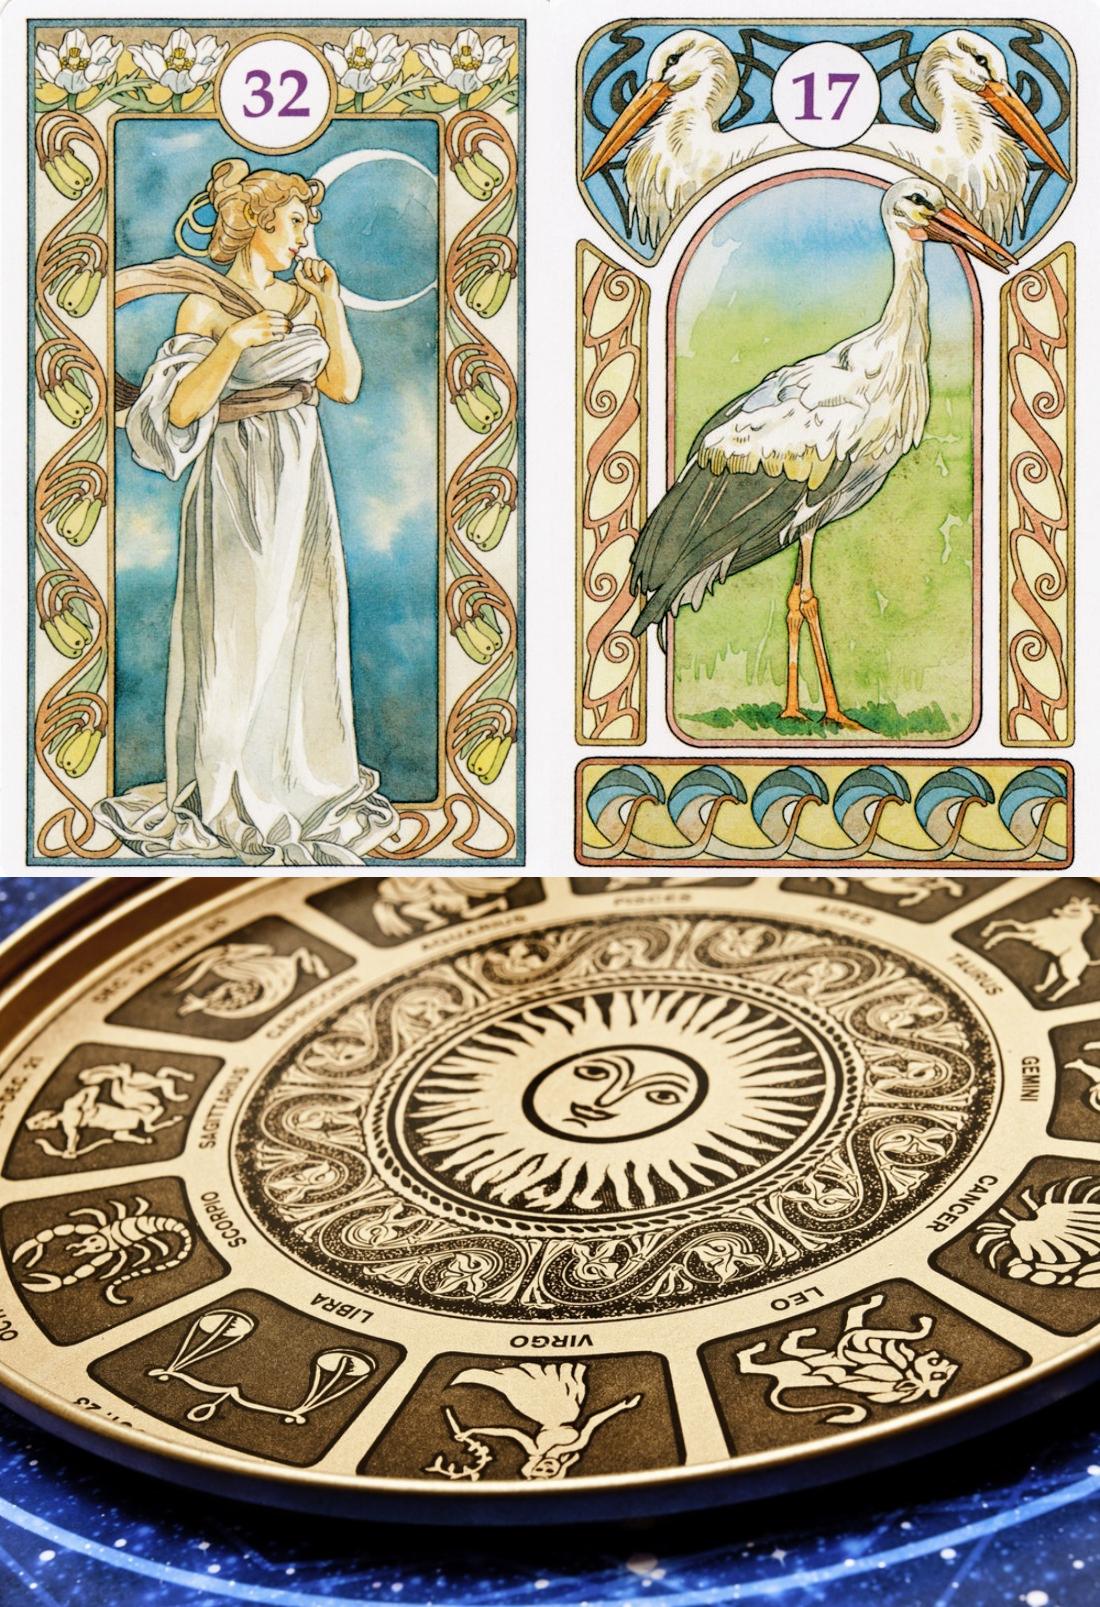 french cartomancy lenormand, list of tarot cards and lenormand tarot